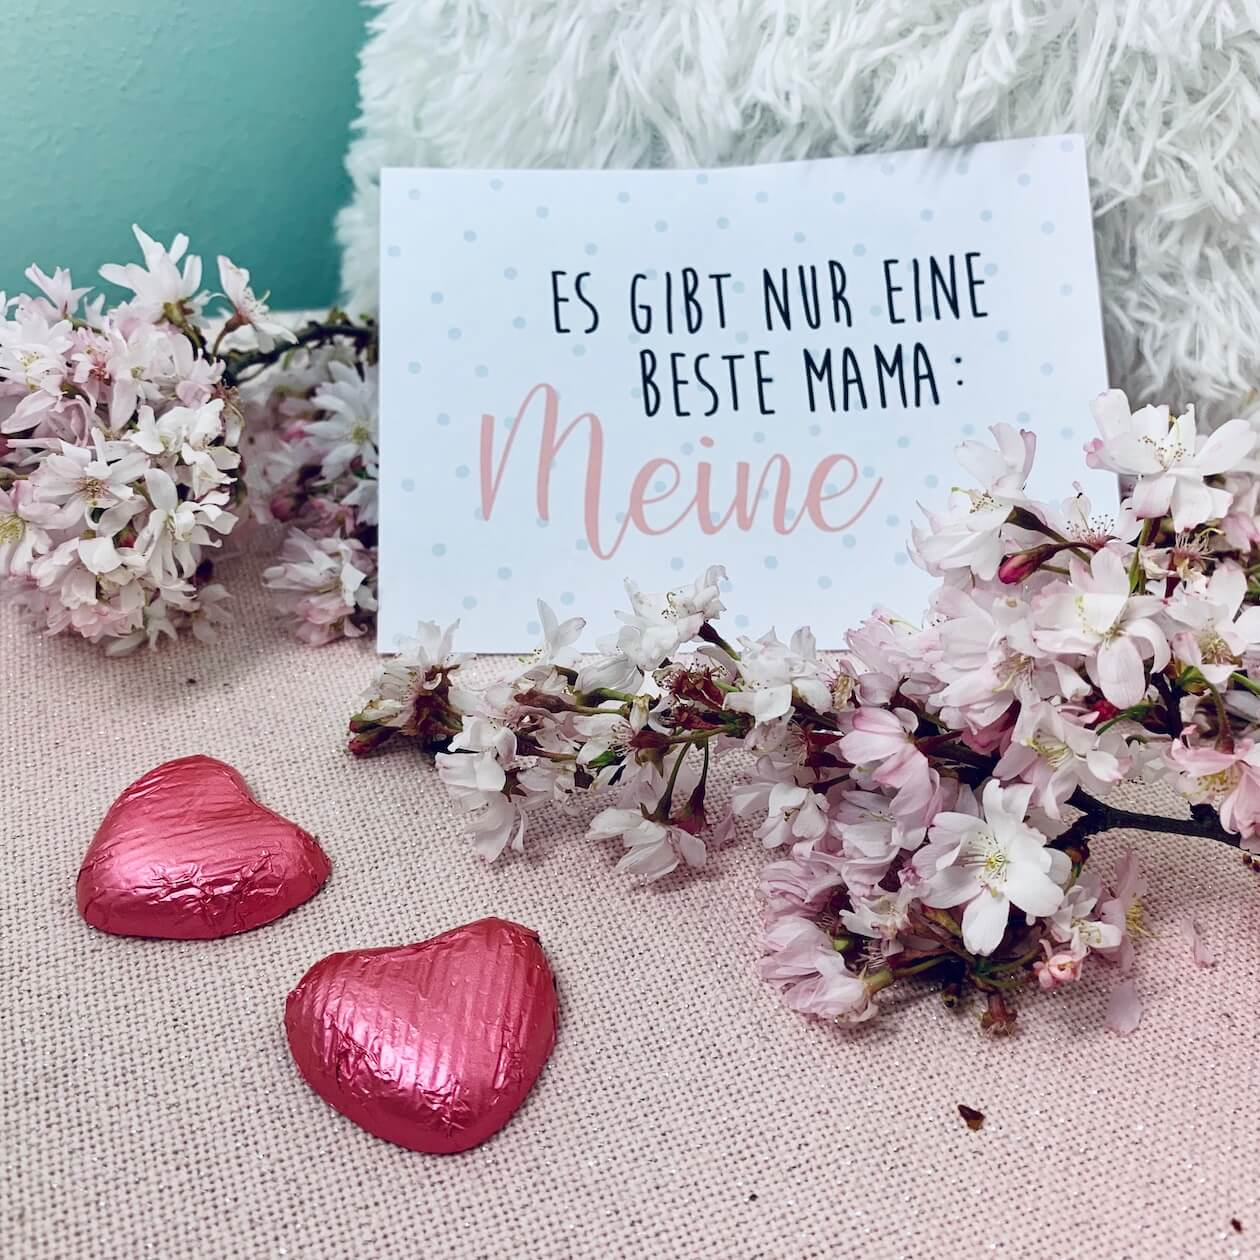 Muttertagskarten zum Ausdrucken